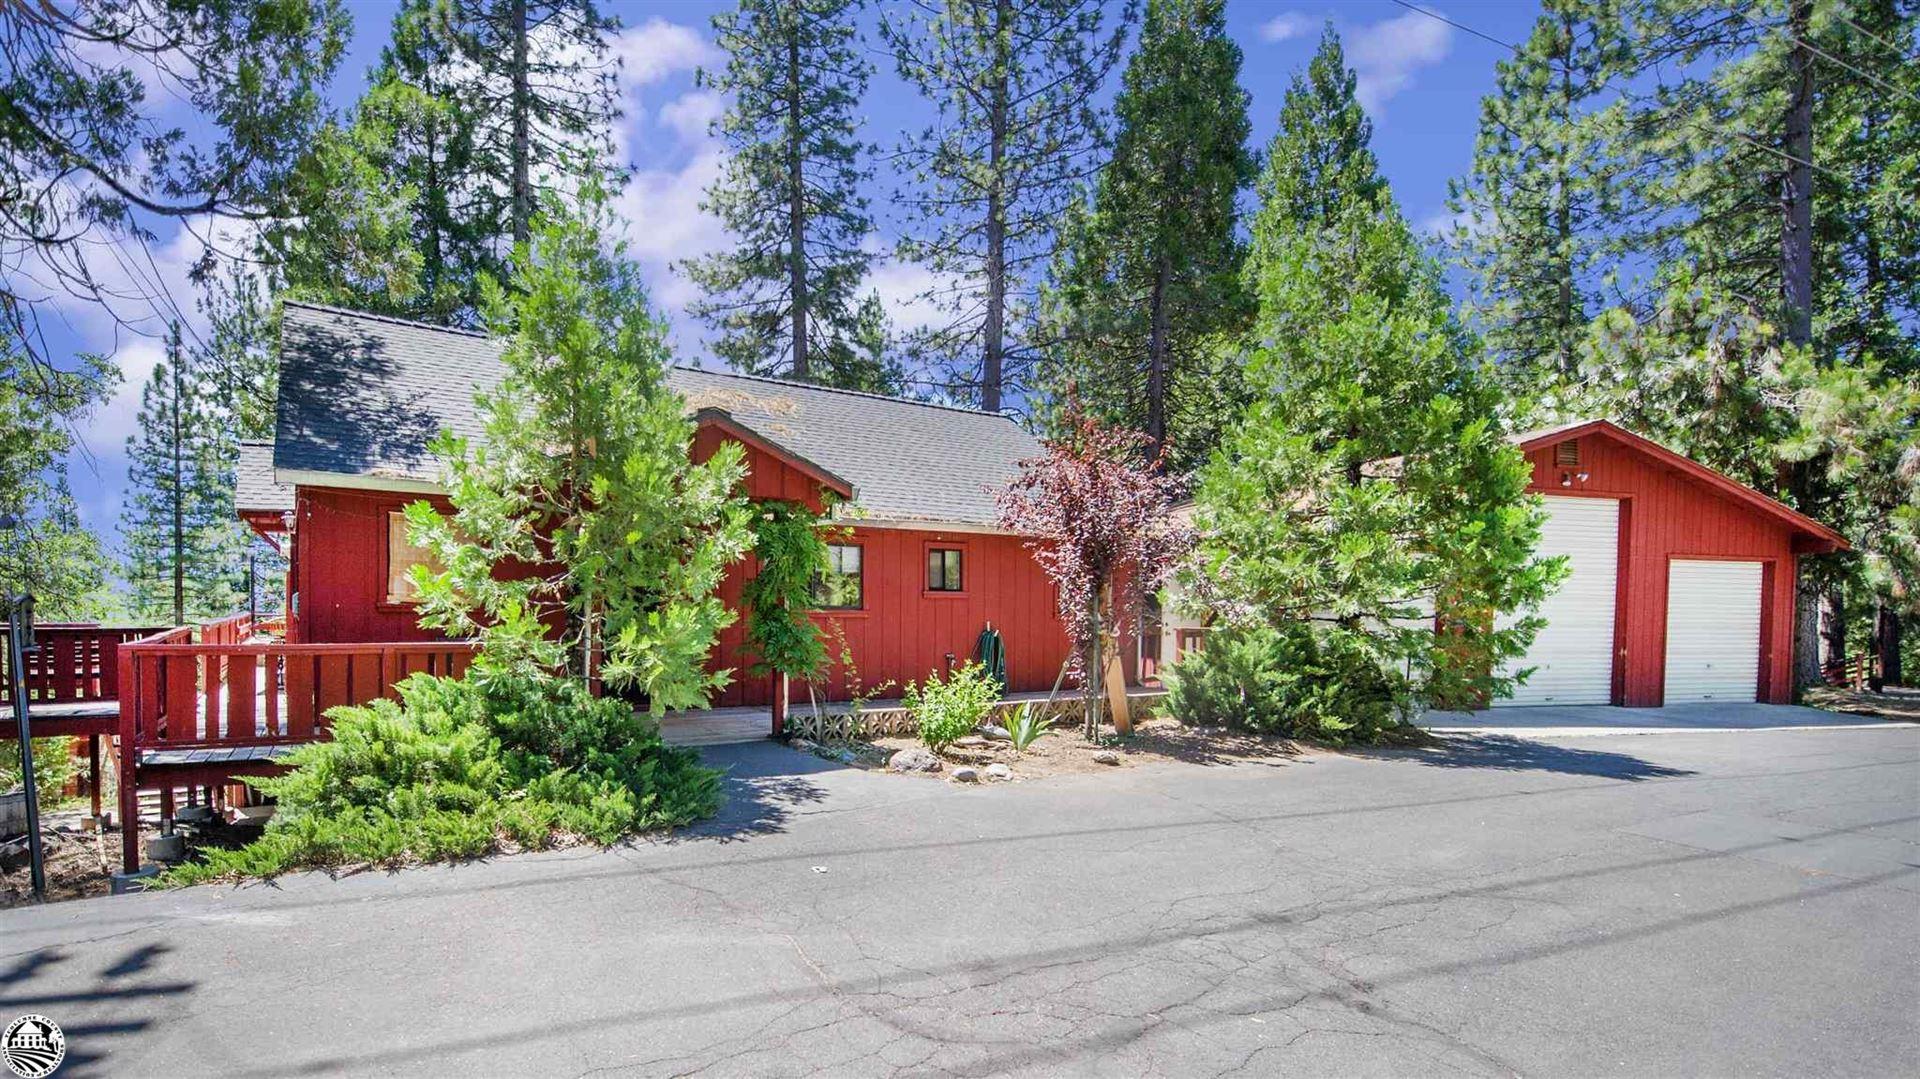 25109 & 25117 State Hwy 108, Long Barn, CA 95346 - MLS#: 20201007